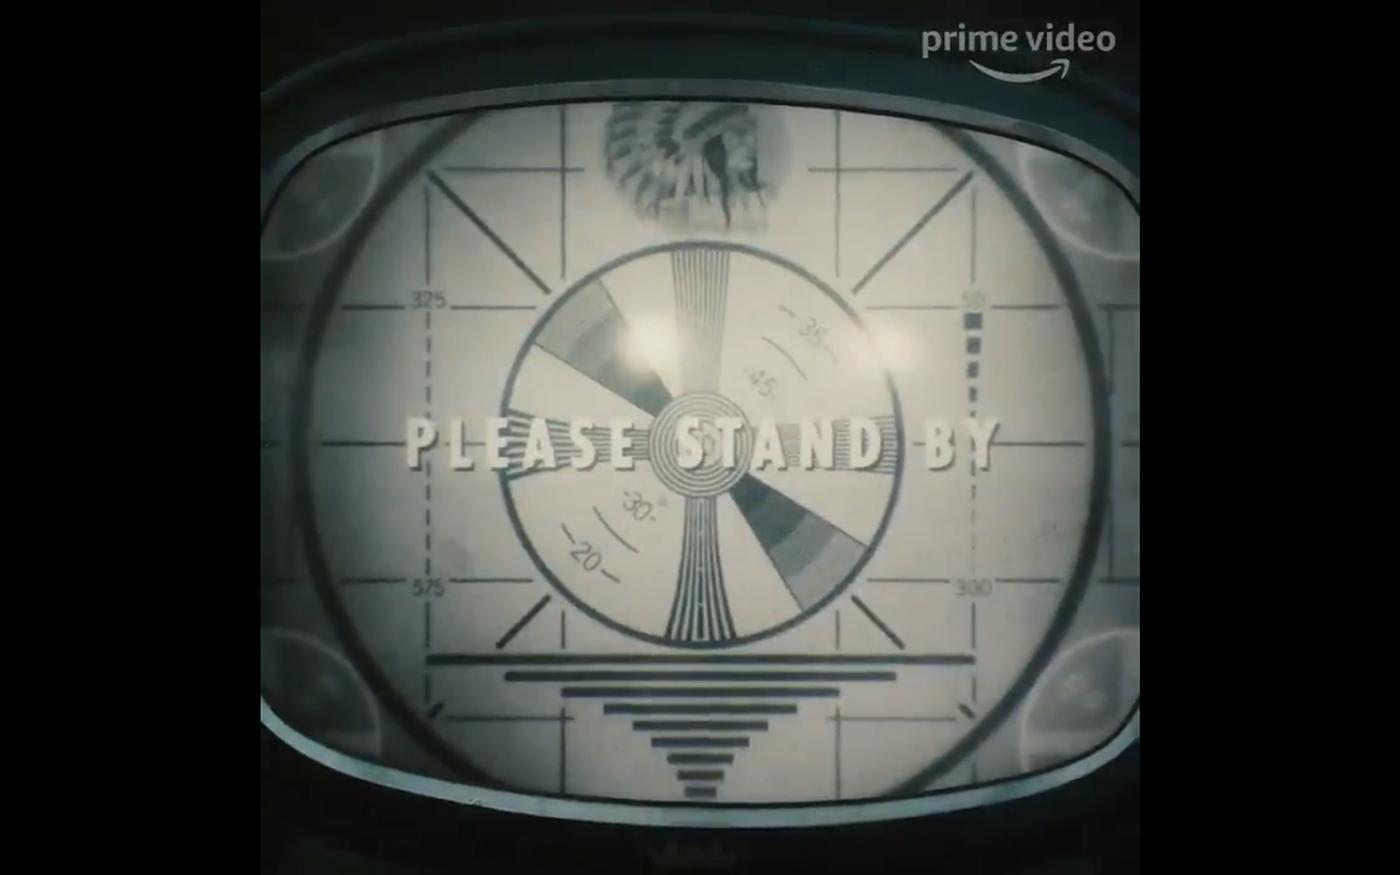 Amazon Prime Vidéo Please Stand By